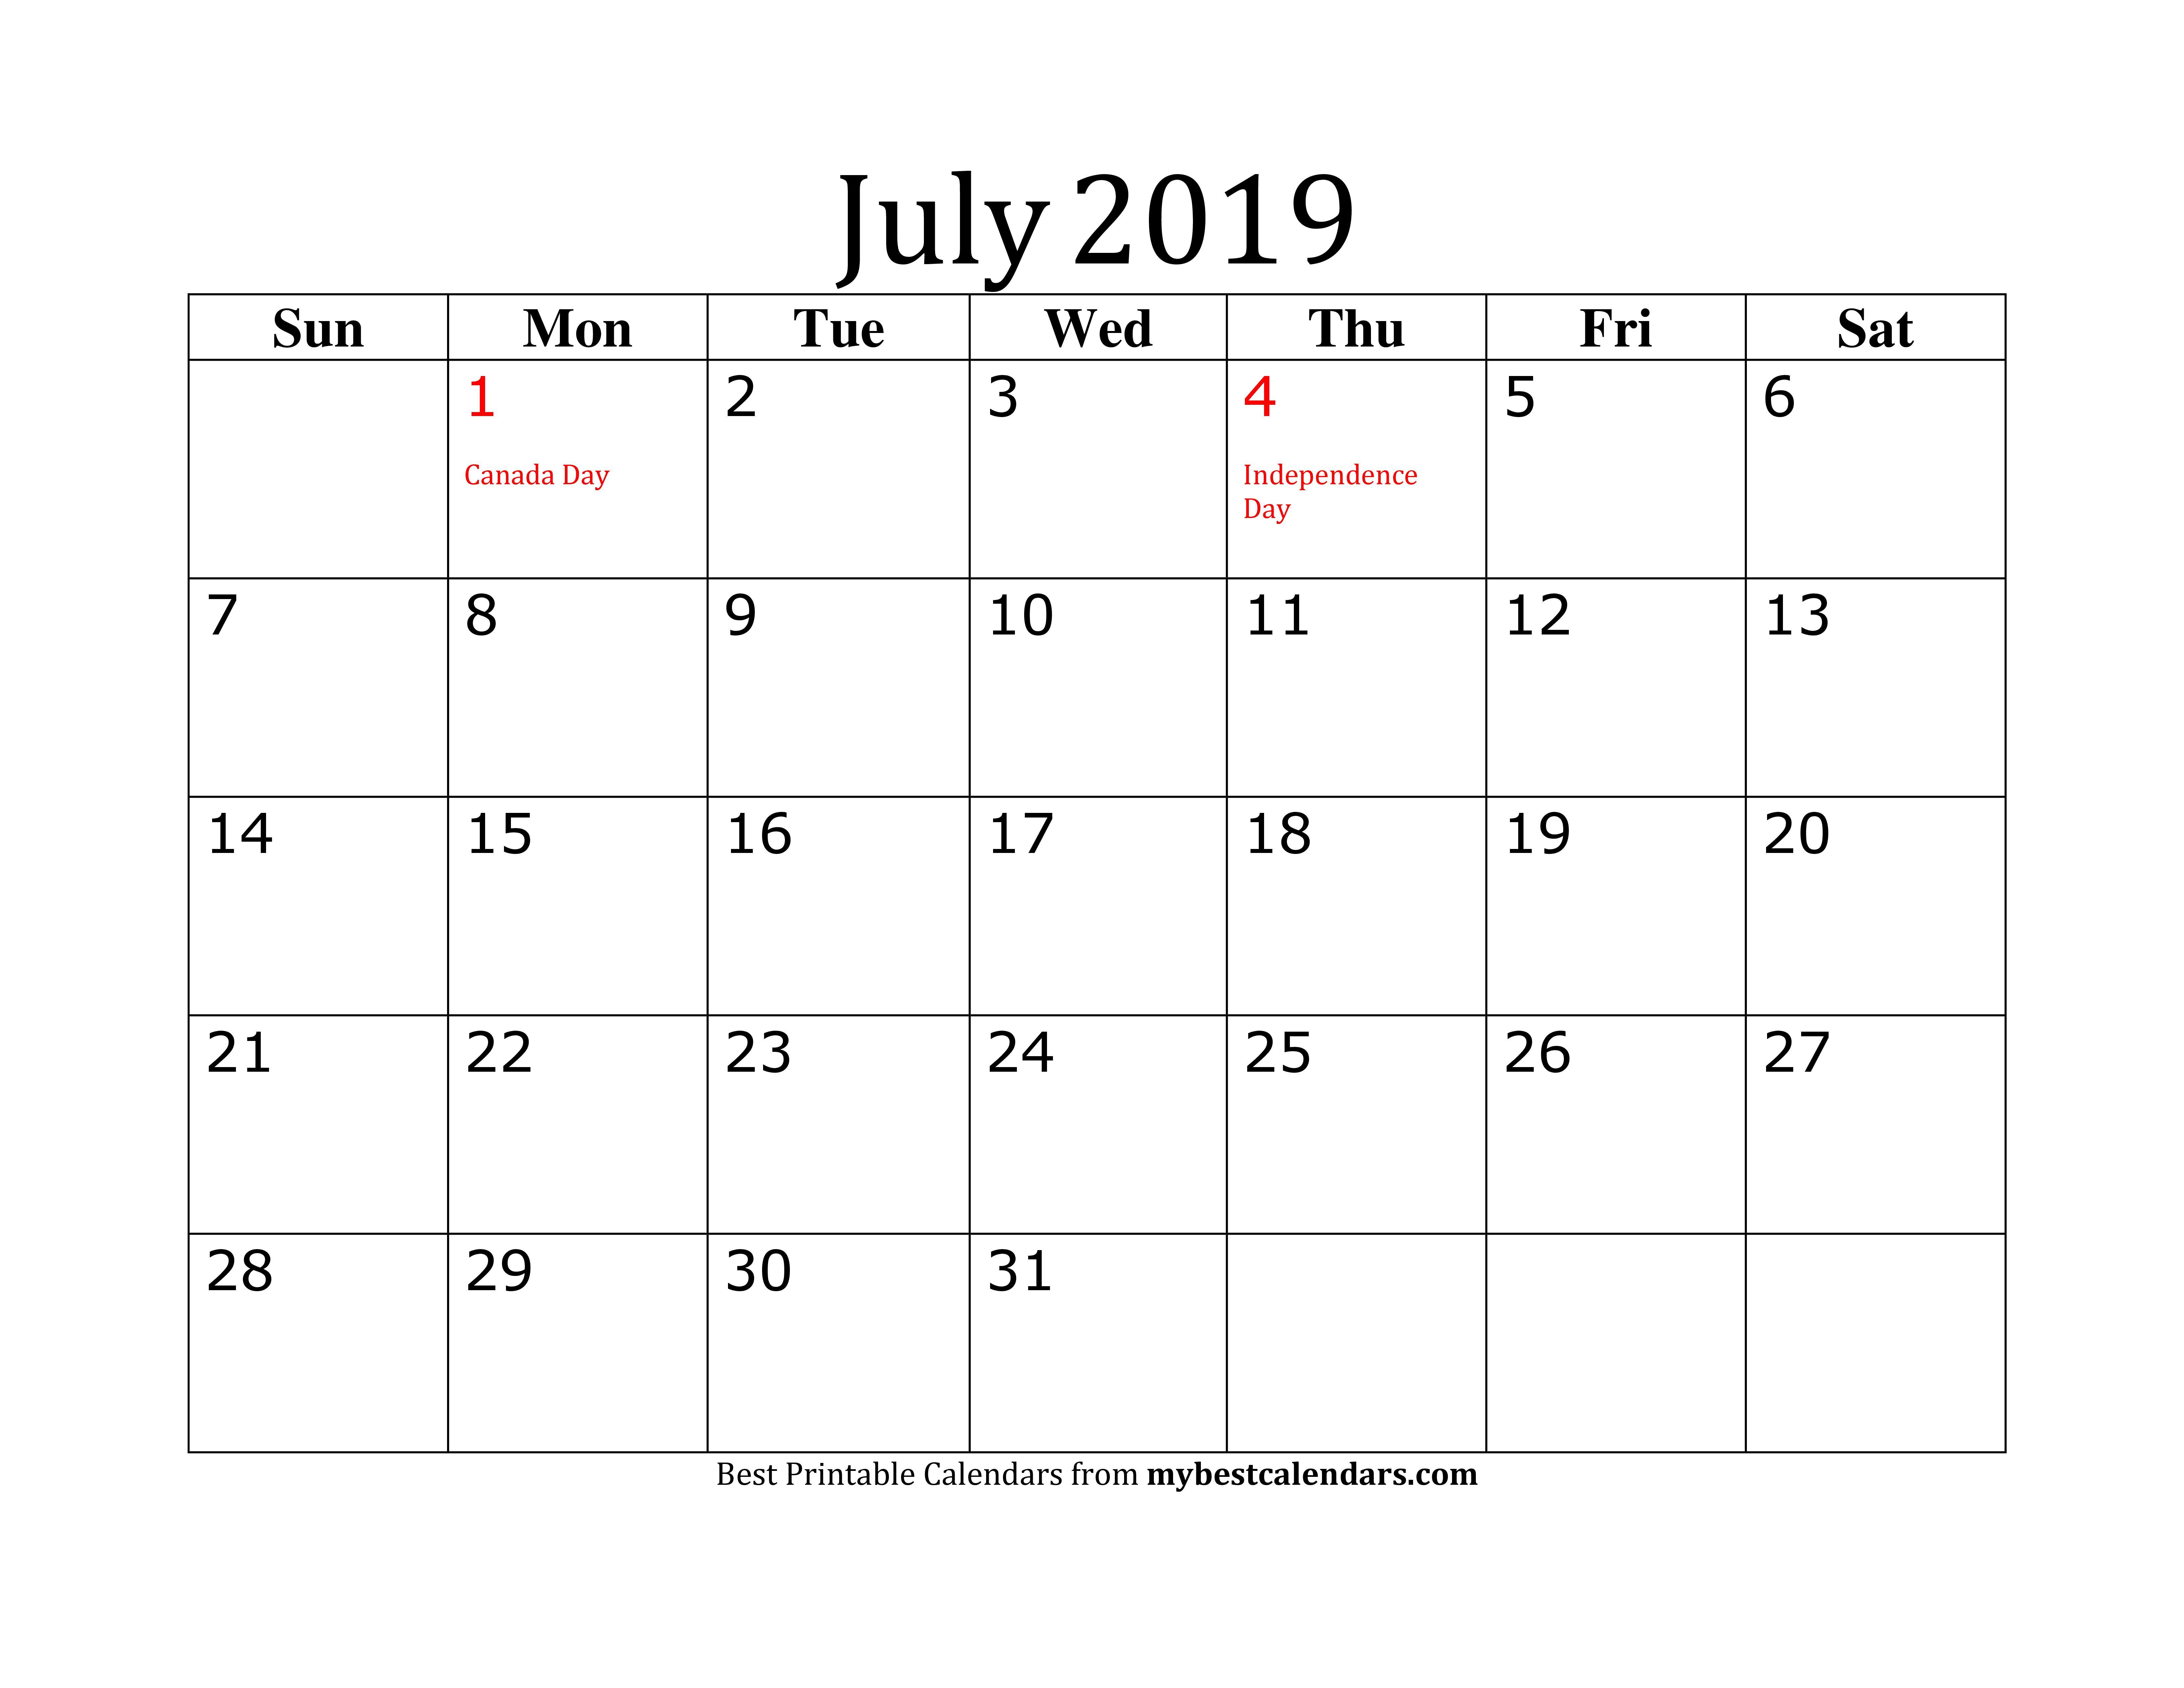 Editable July 2019 Calendar In Pdf, Word, Excel - Printable Format regarding Editable October 2019 Calendar With Religious Holidays